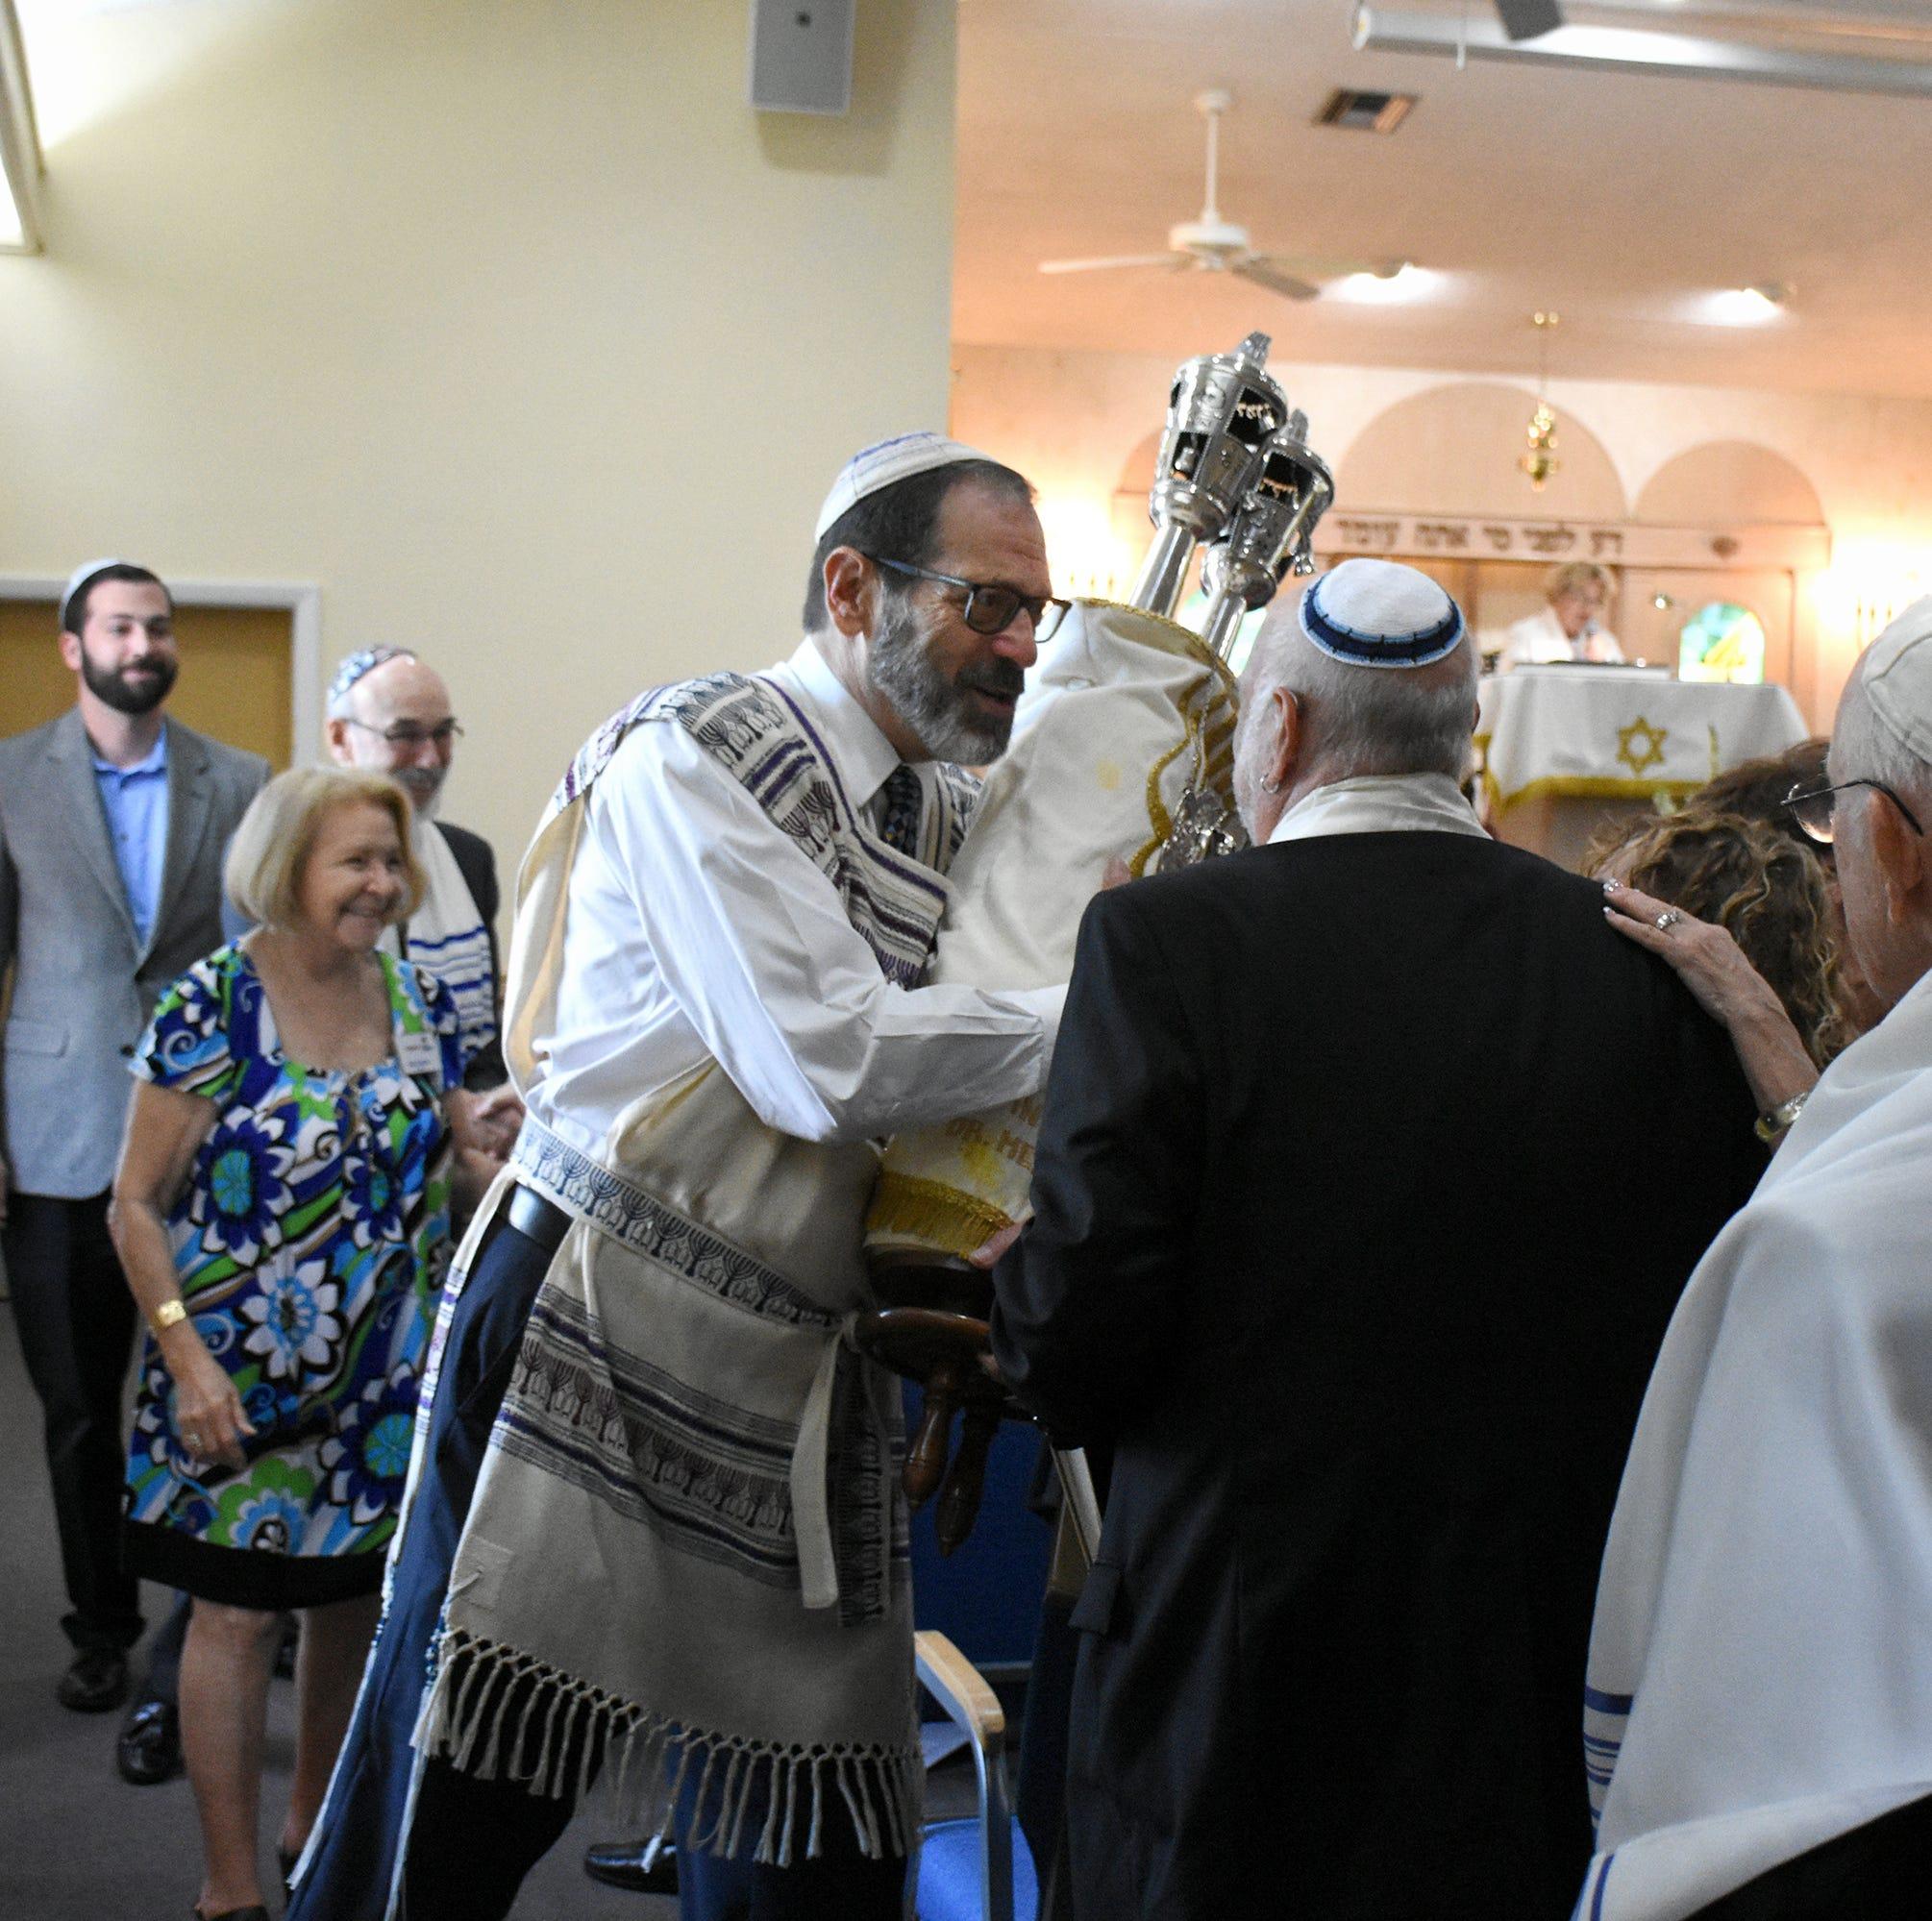 'A period of hope and new beginnings': JCMI celebrates Rosh Hashanah